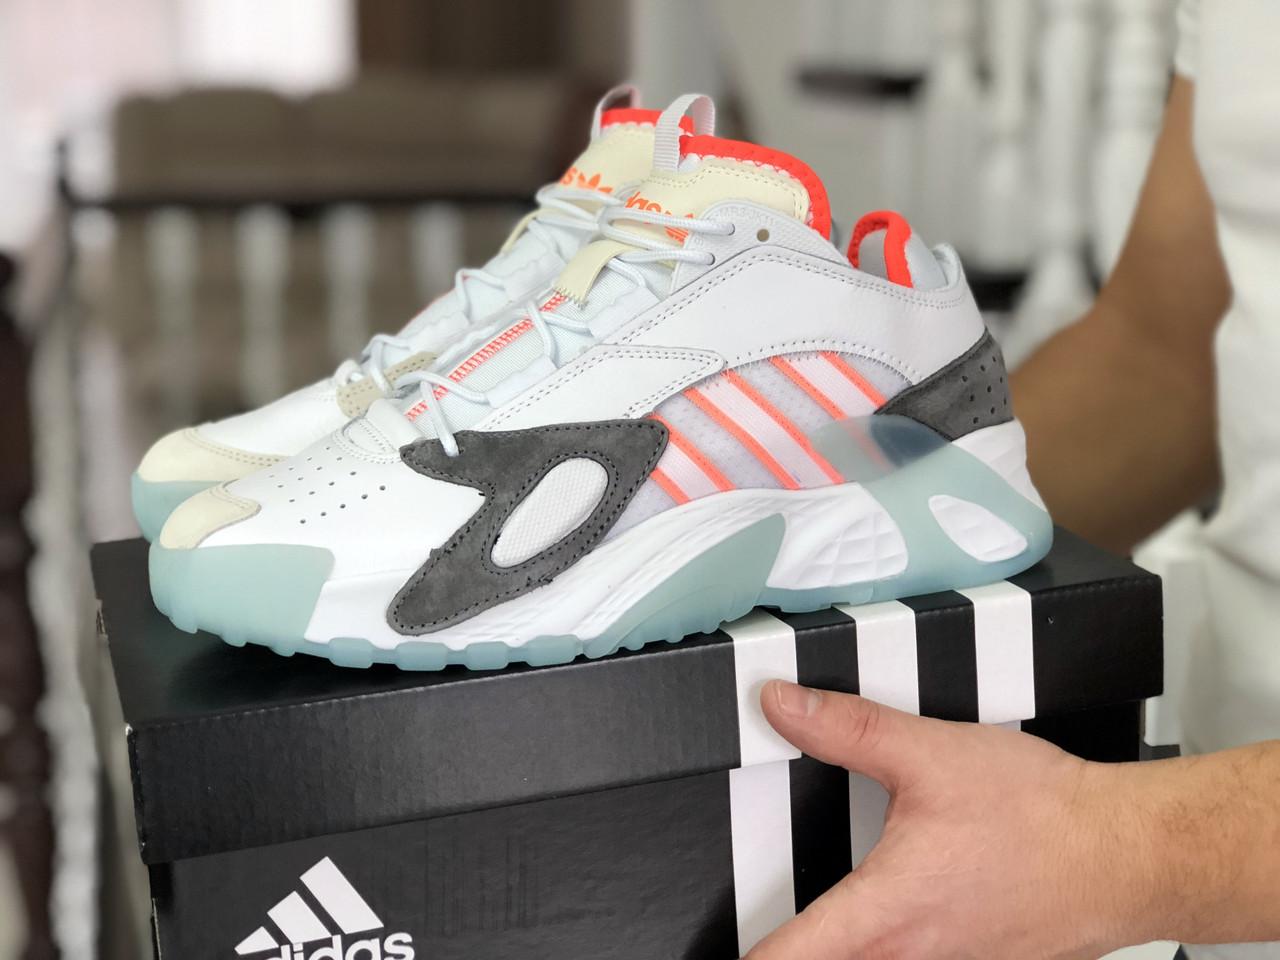 Mужские кроссовки Adidas Streetball